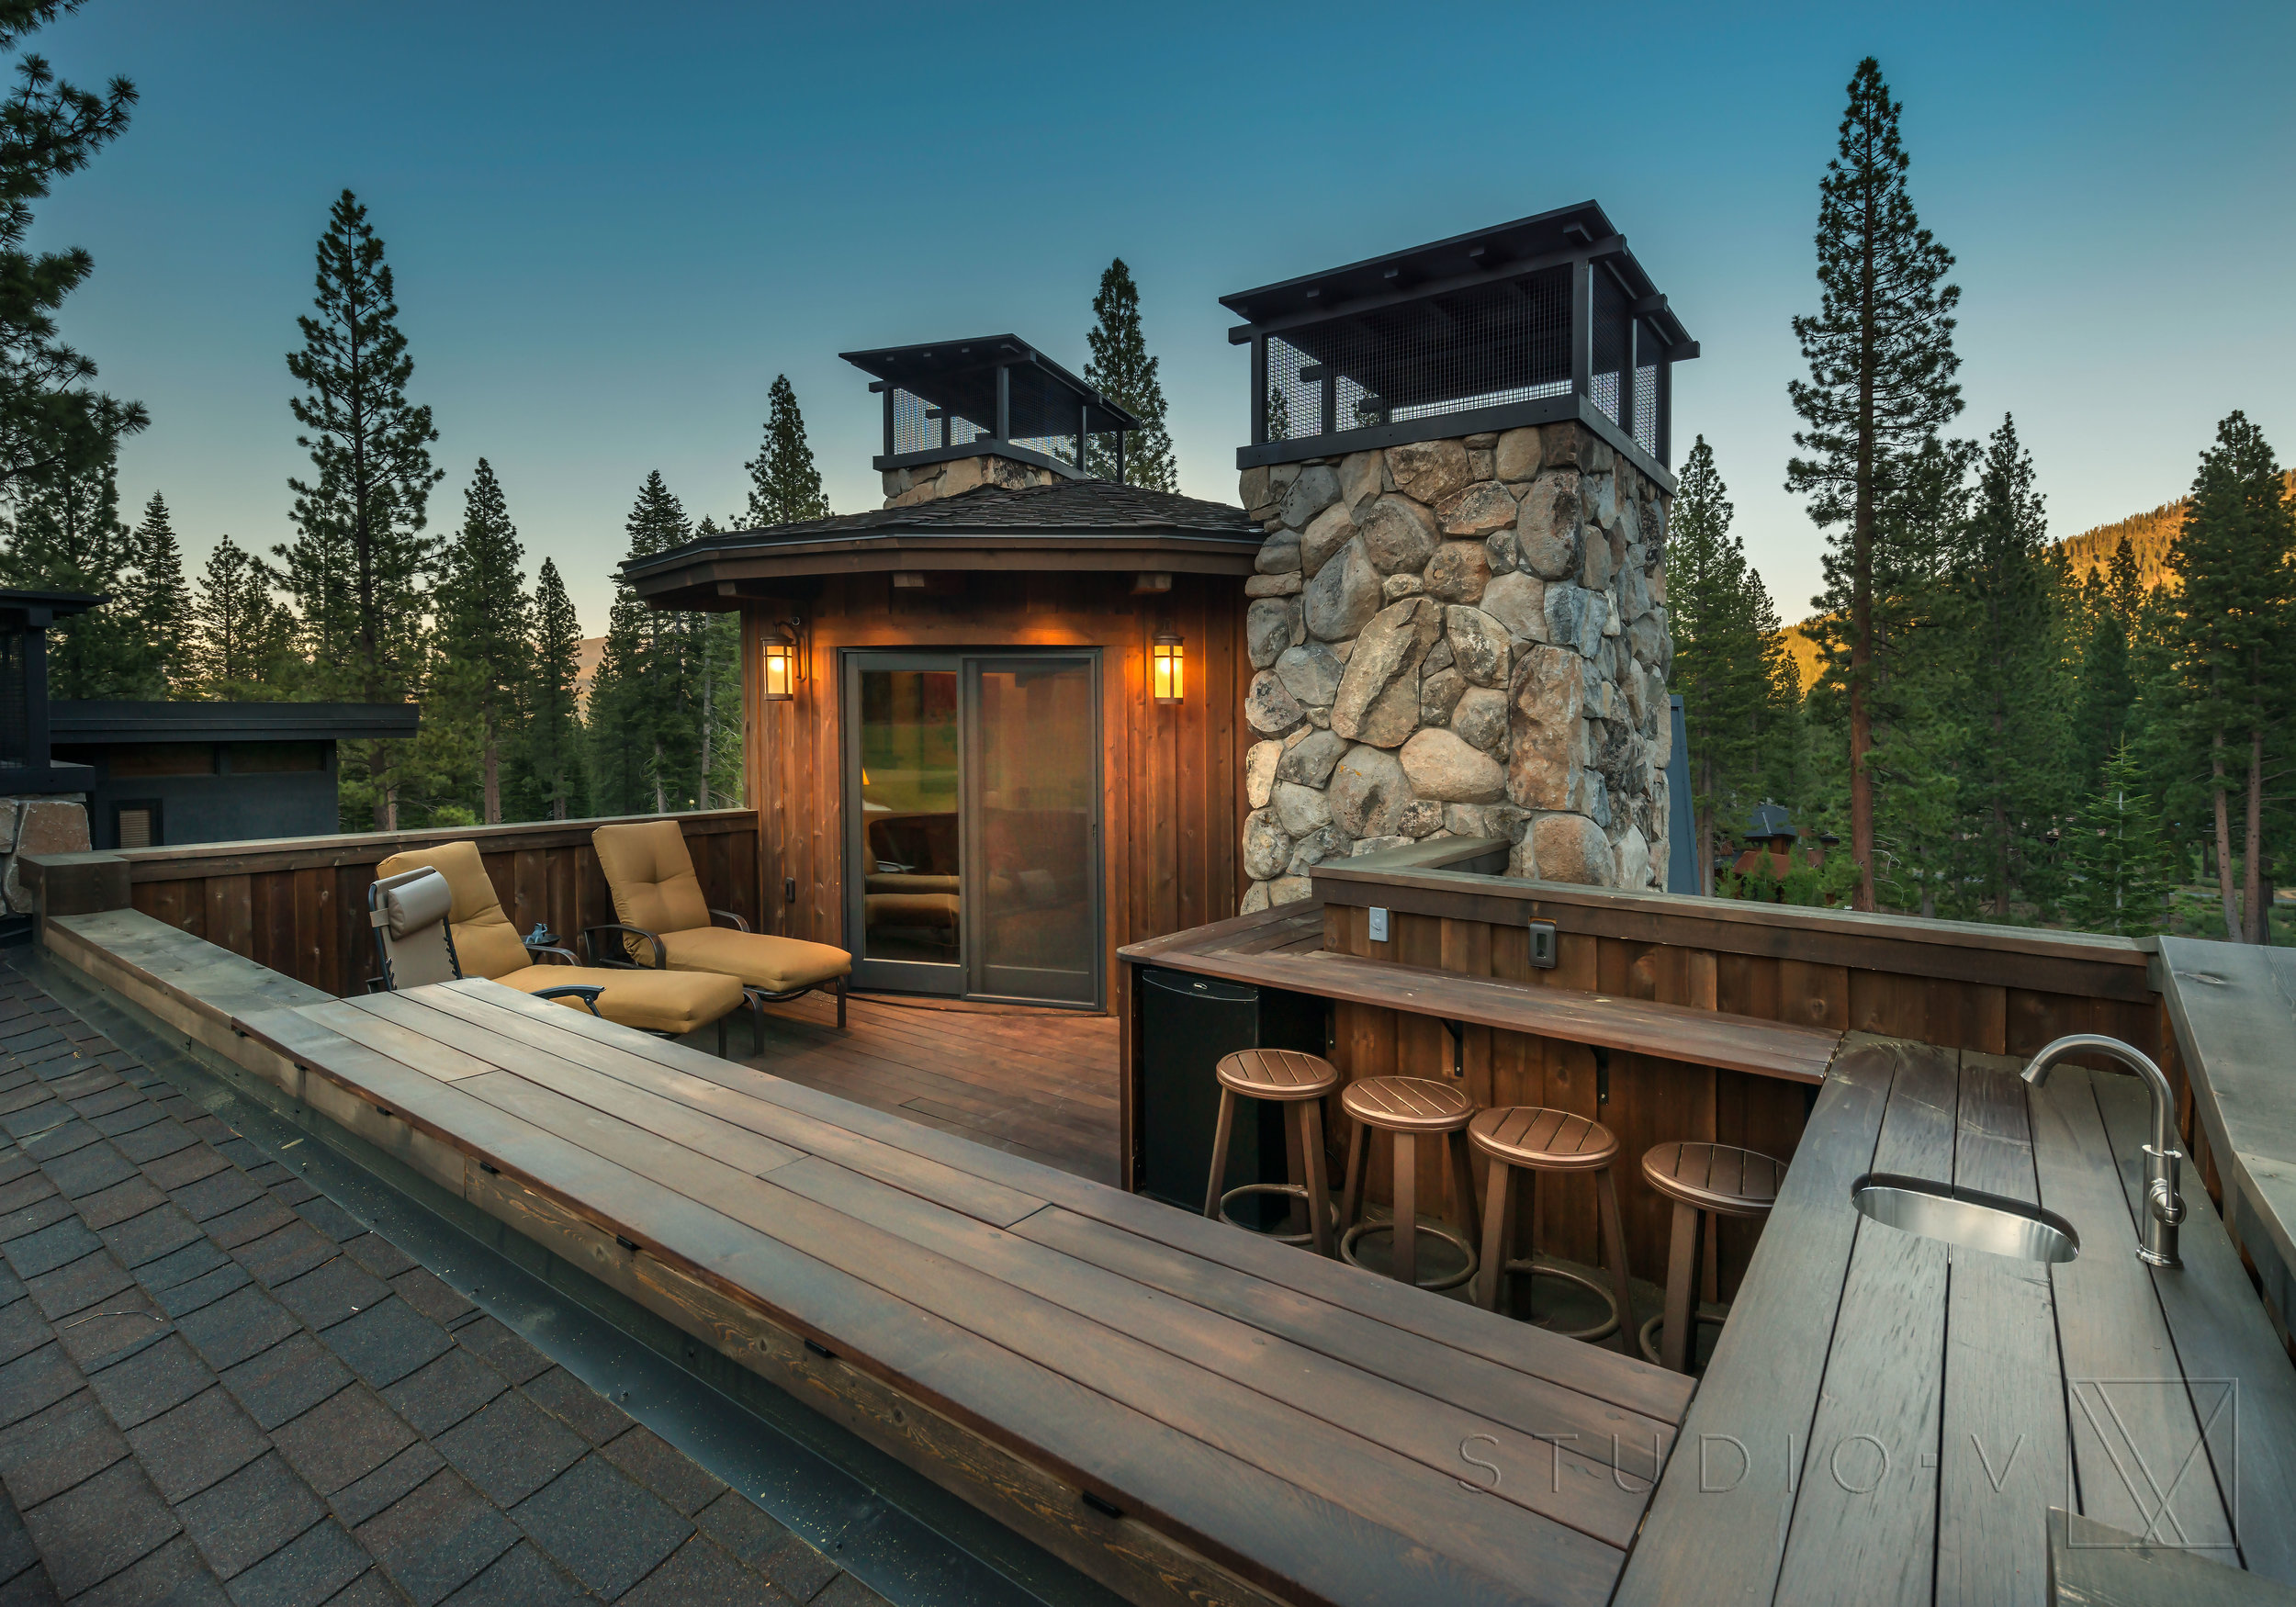 Lodge Cabin Tahoe Truckee Martis Camp CA California Traditional Studio V Interior Architecture Design Scottsdale Arizona AZ (28).jpg